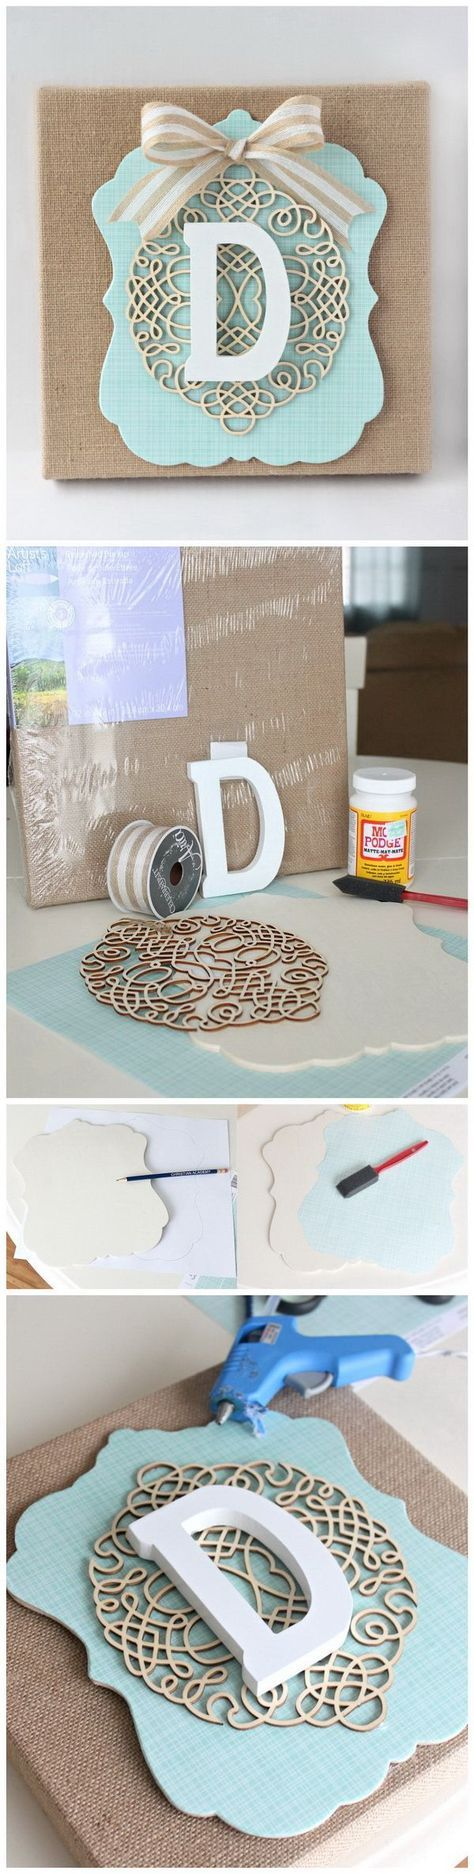 20 Pretty Diy Decorative Letter Ideas Amp Tutorials With Images Dollar Store Diy Dollar